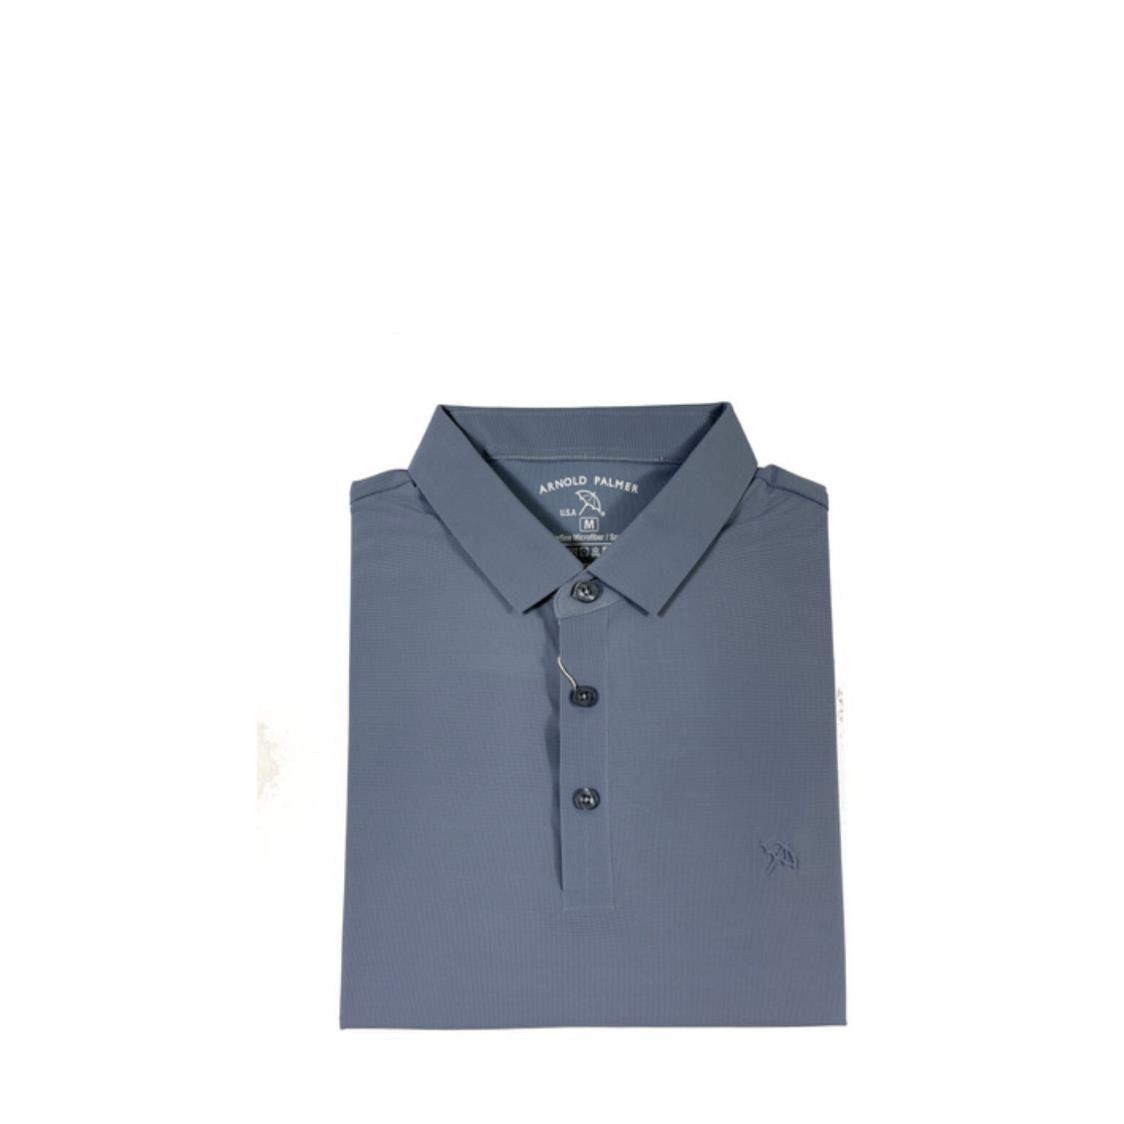 Short Sleeve Solid Polo ARP1004 Grey